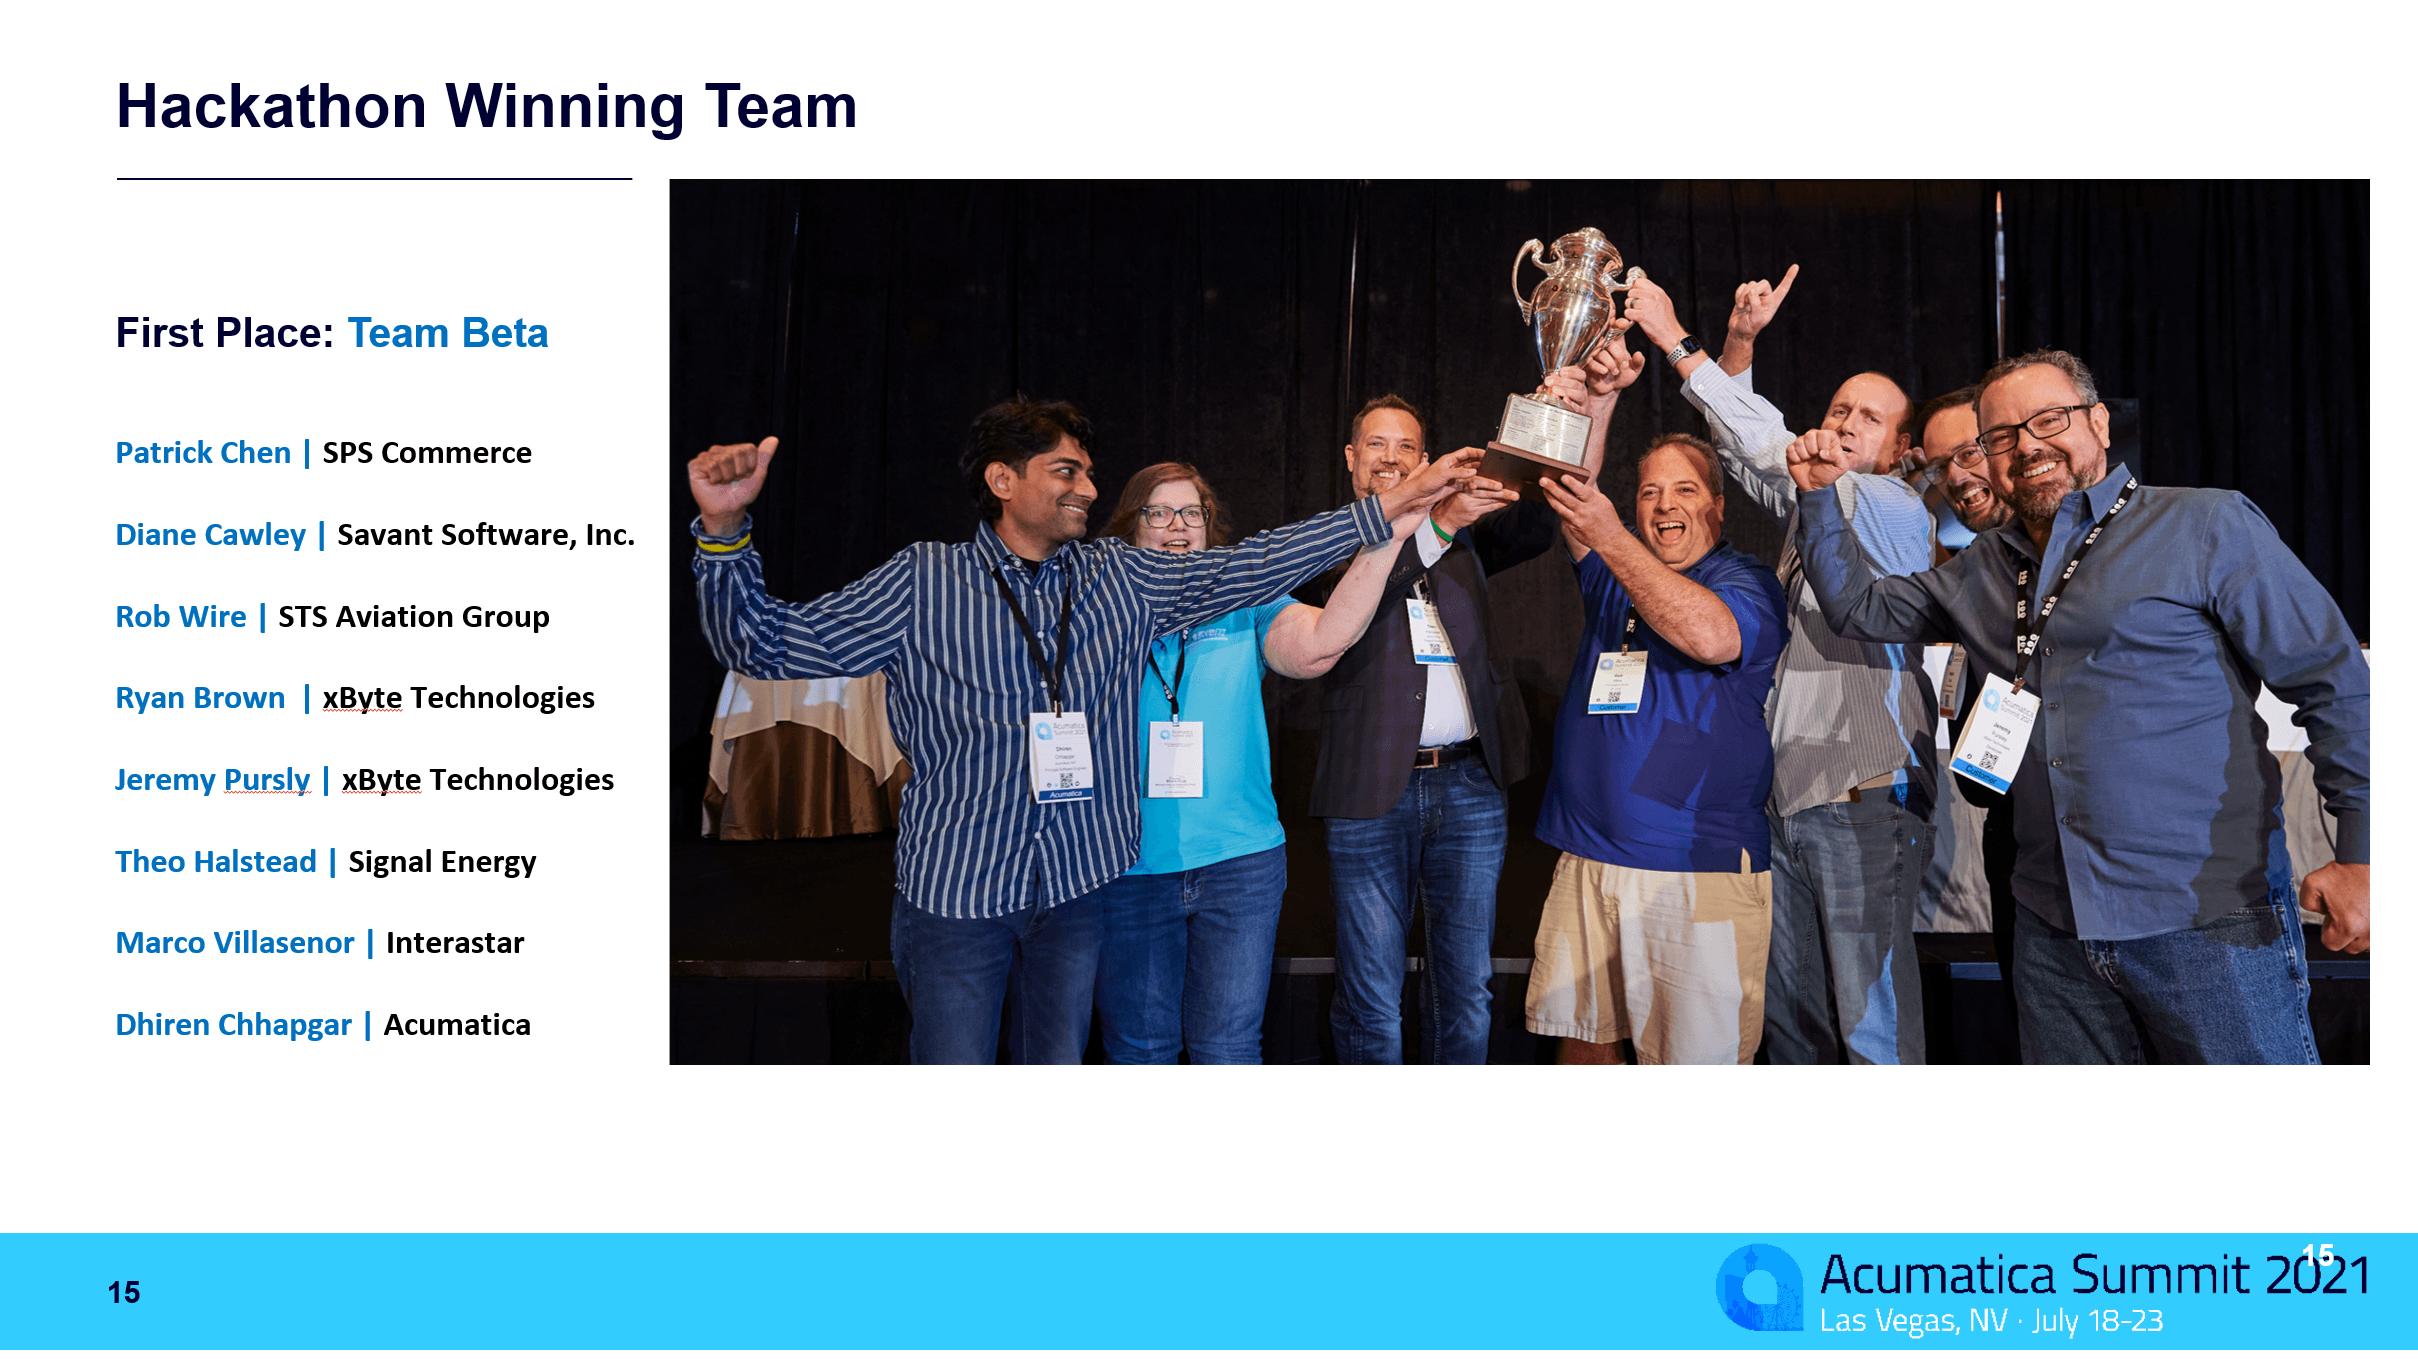 2021 Hackathon Winning Team